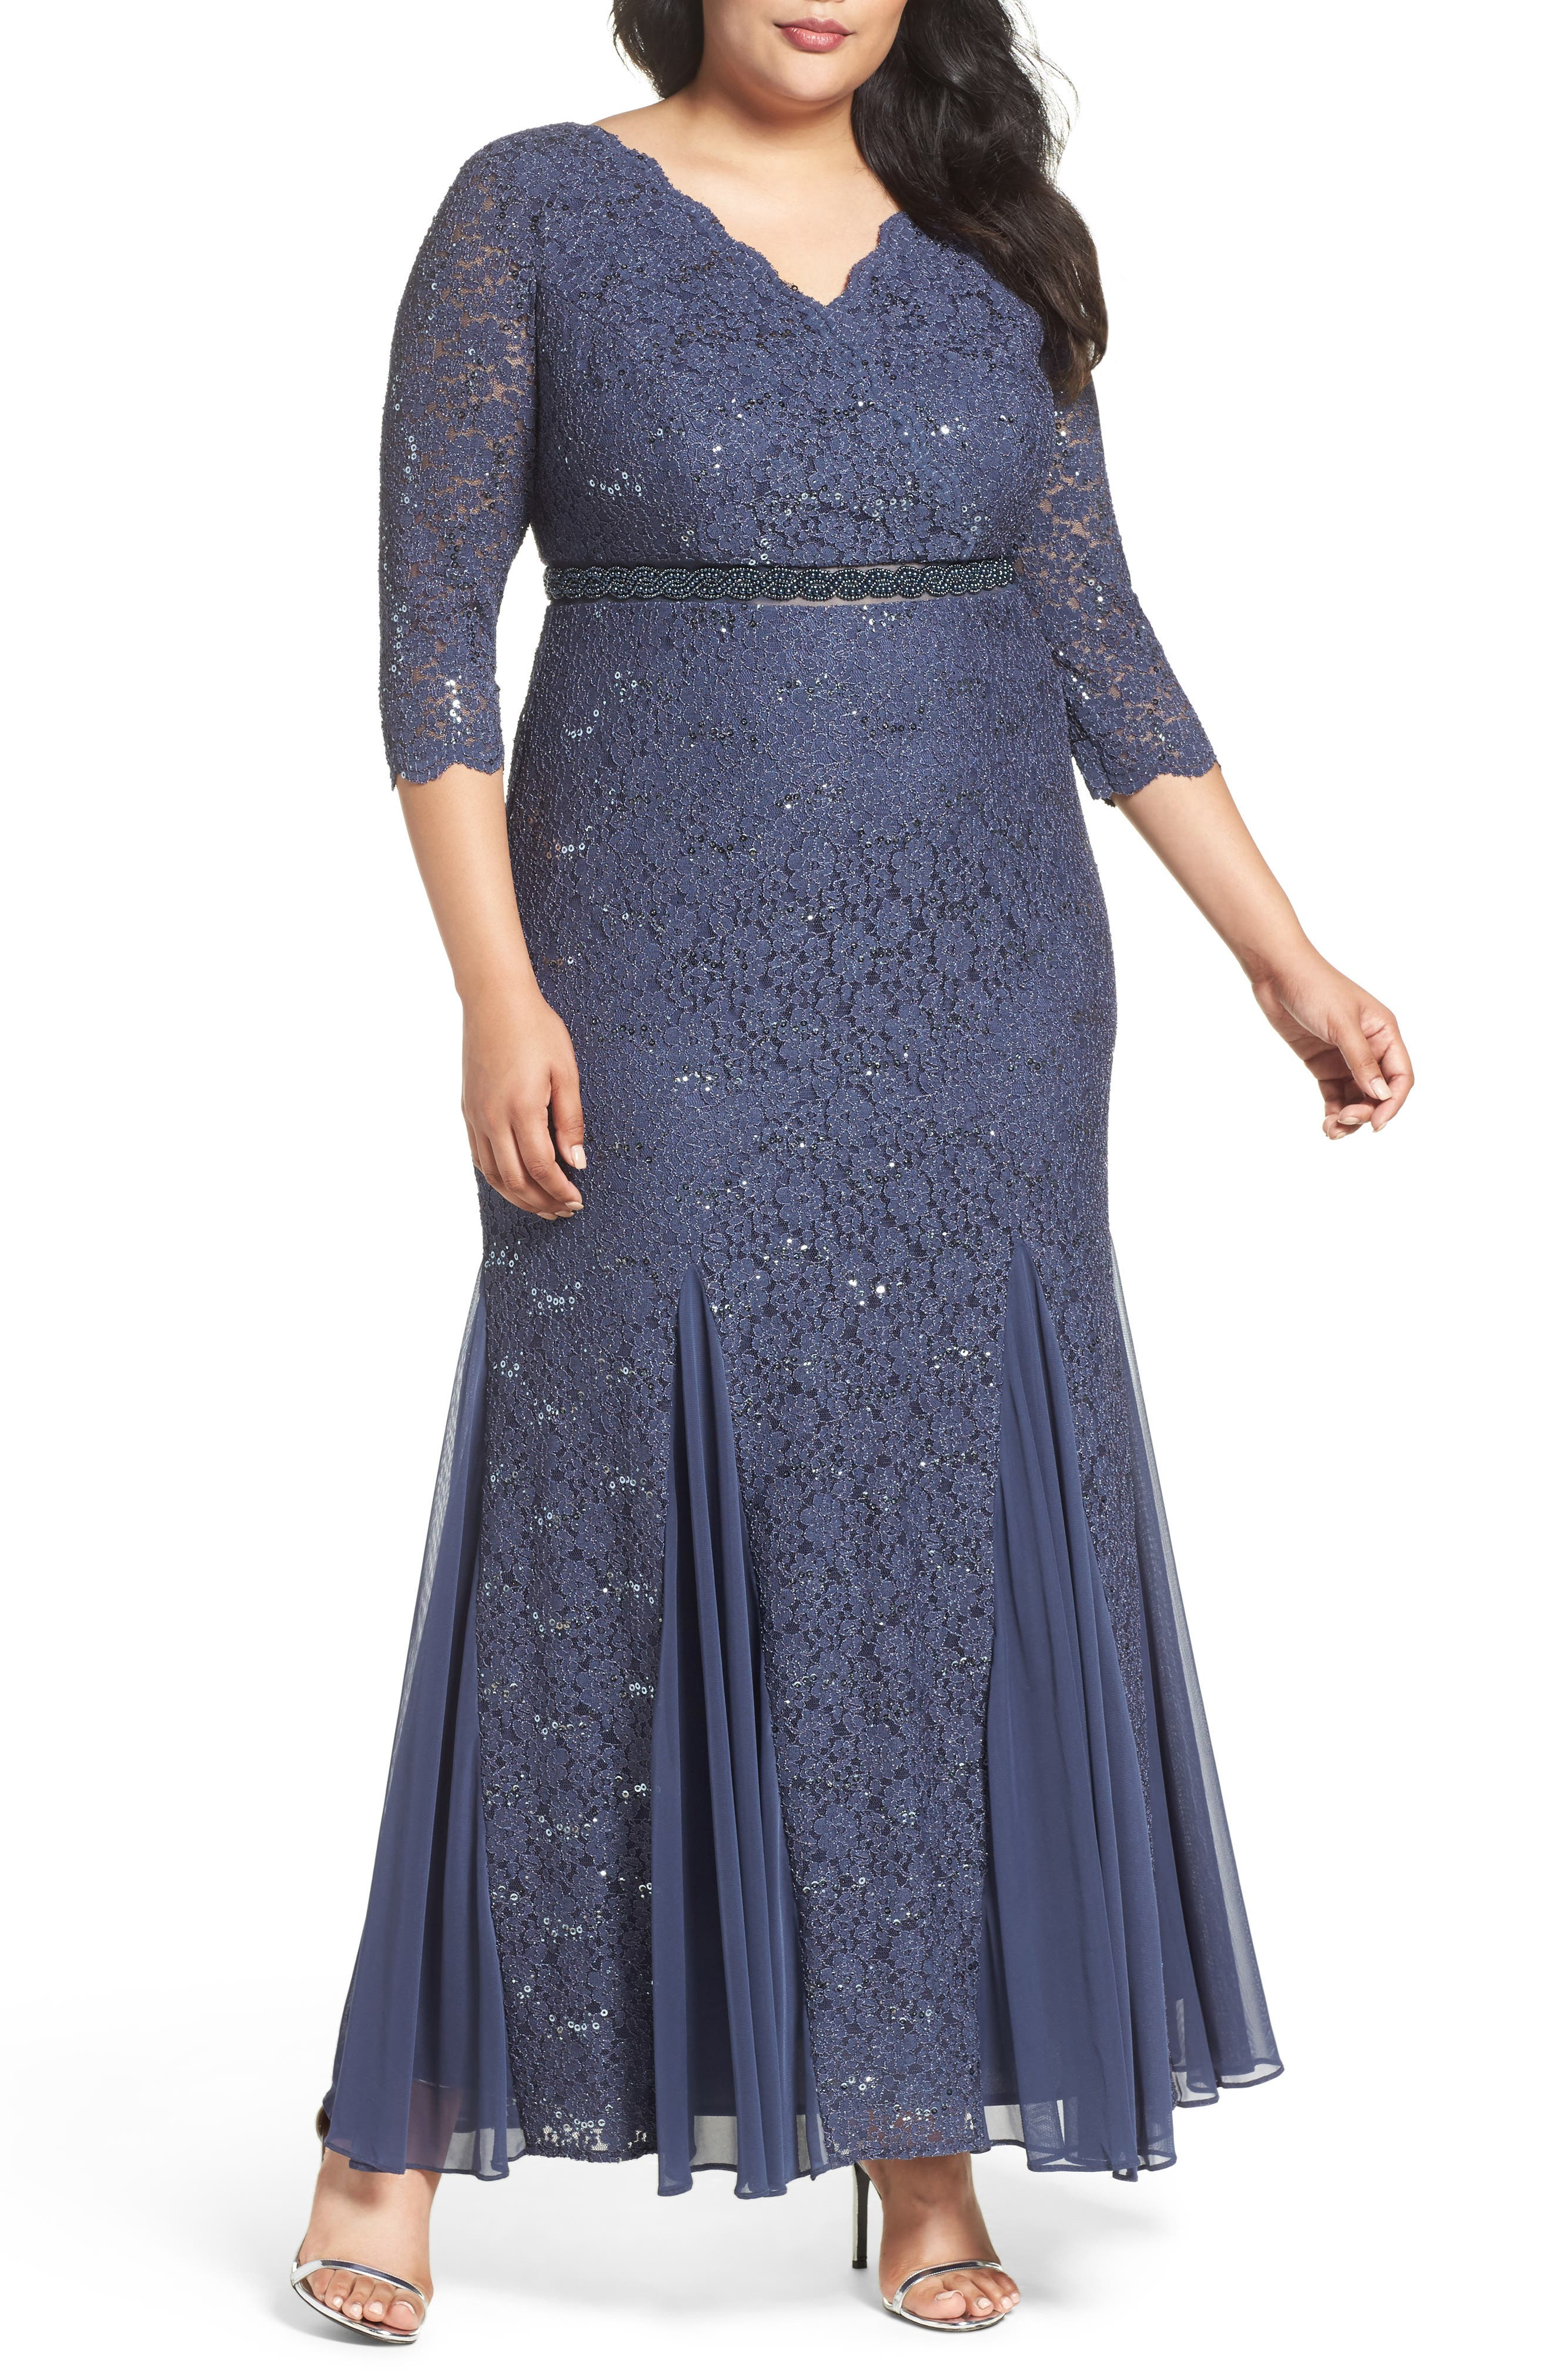 ALEX EVENINGS Embellished Waist Sequin Lace Dress